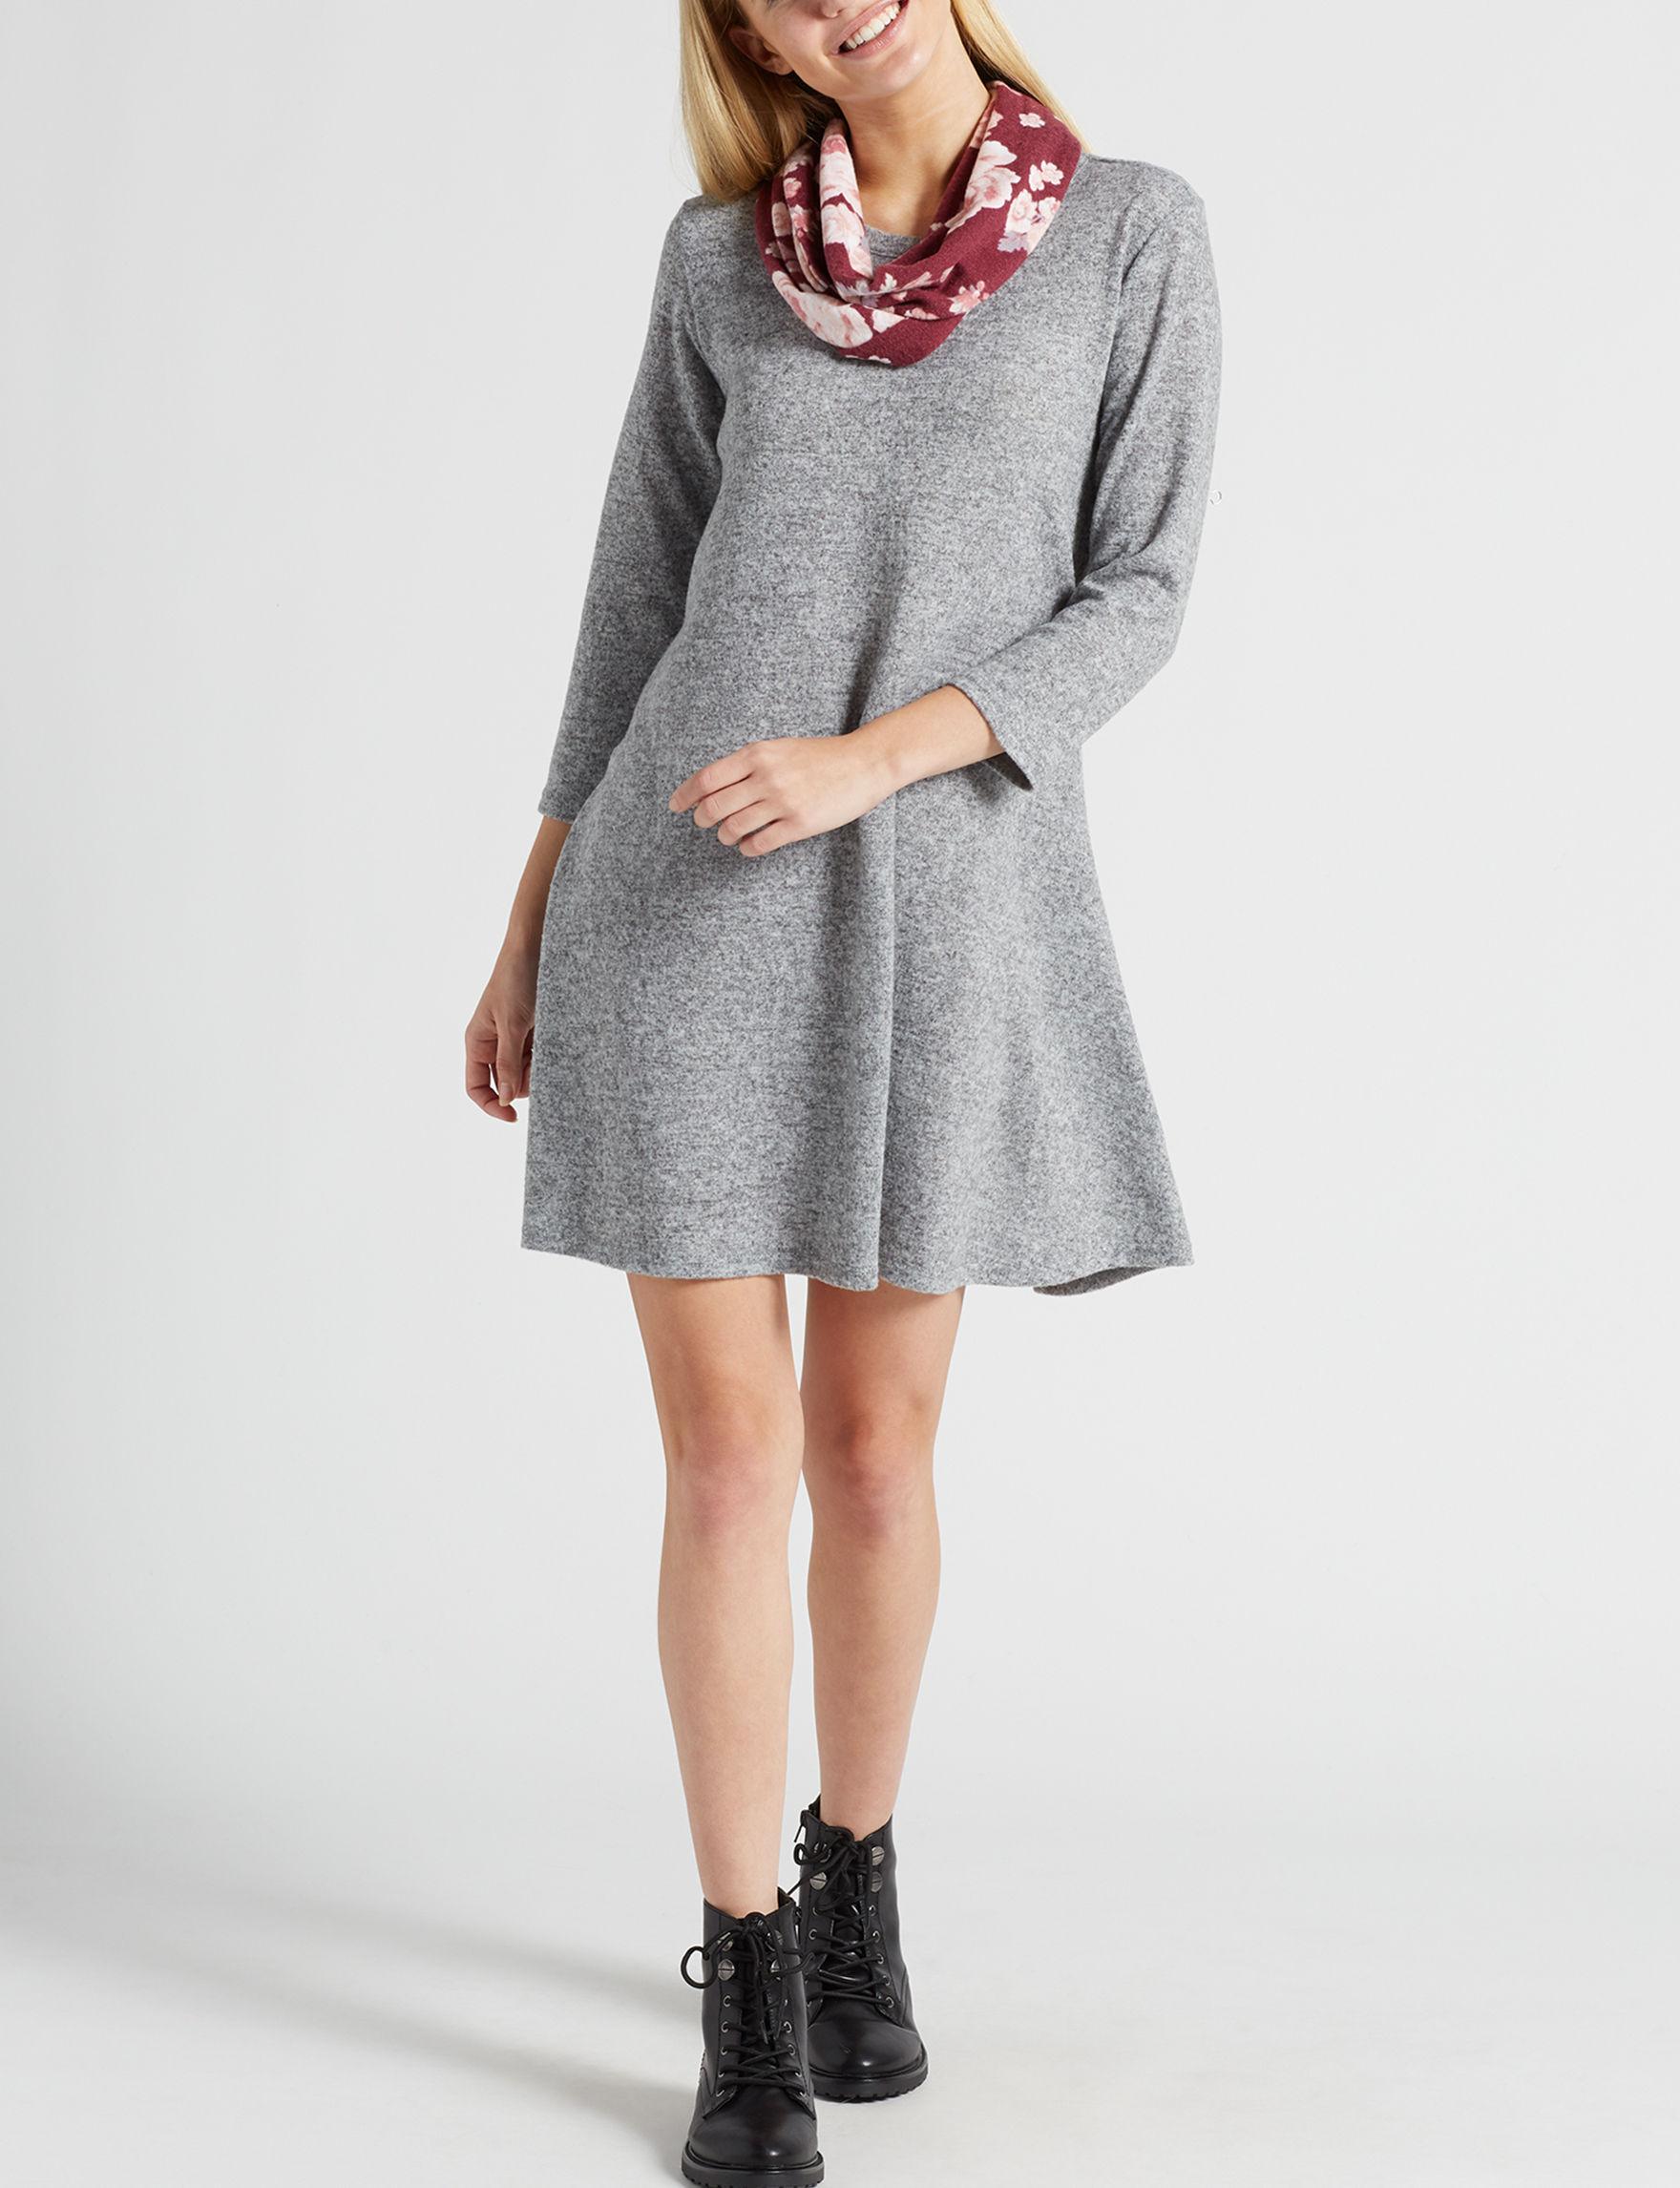 Wishful Park Grey Everyday & Casual Shift Dresses